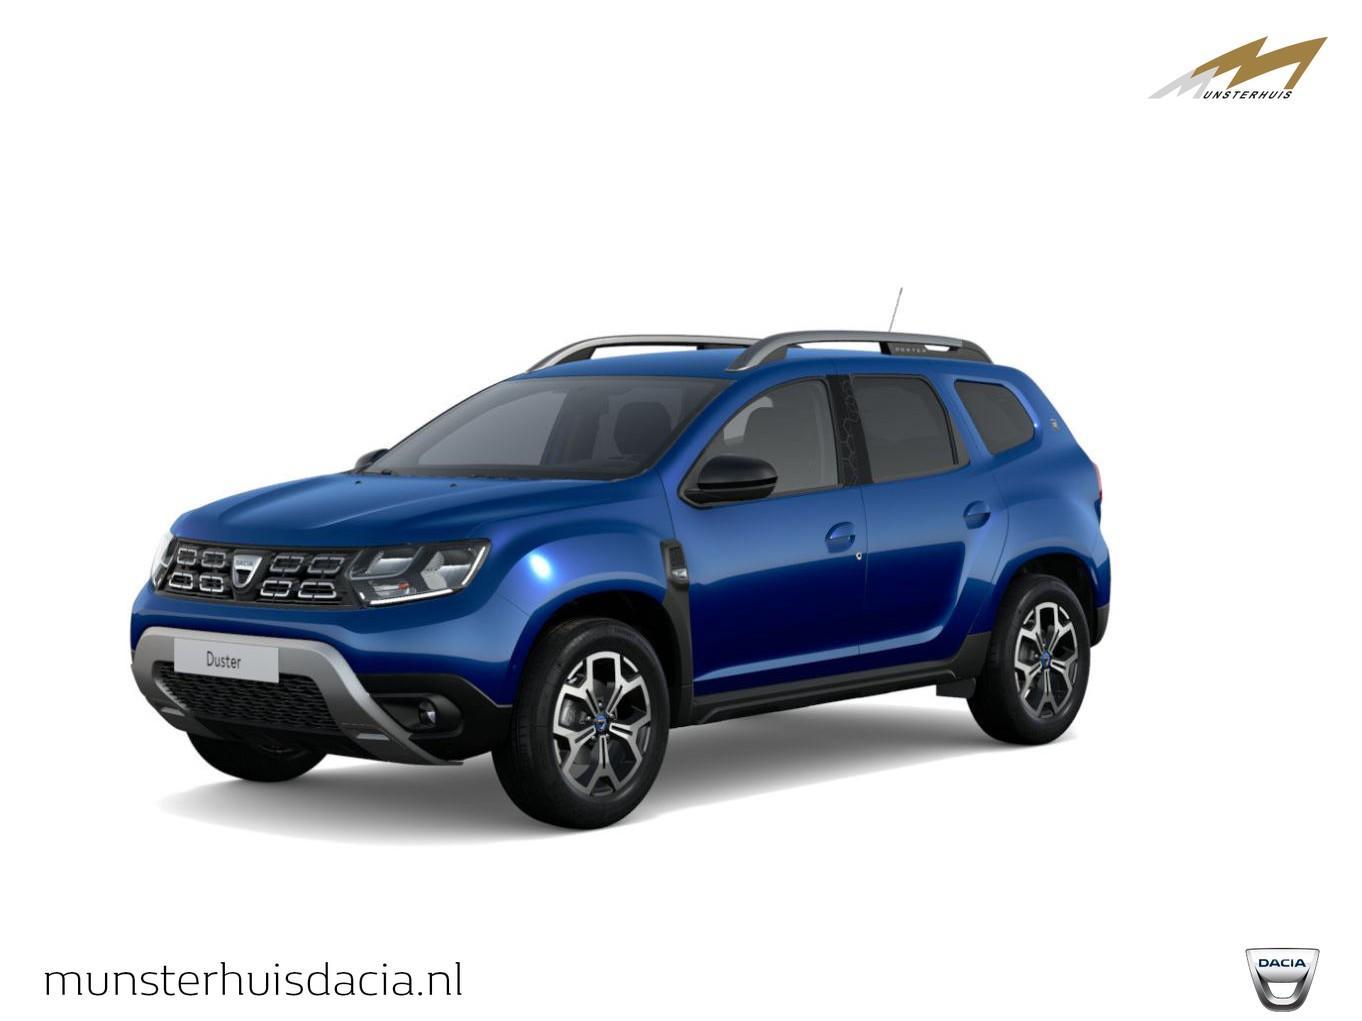 Dacia Duster Tce 130 gpf série limitée 15th anniversary - nieuw